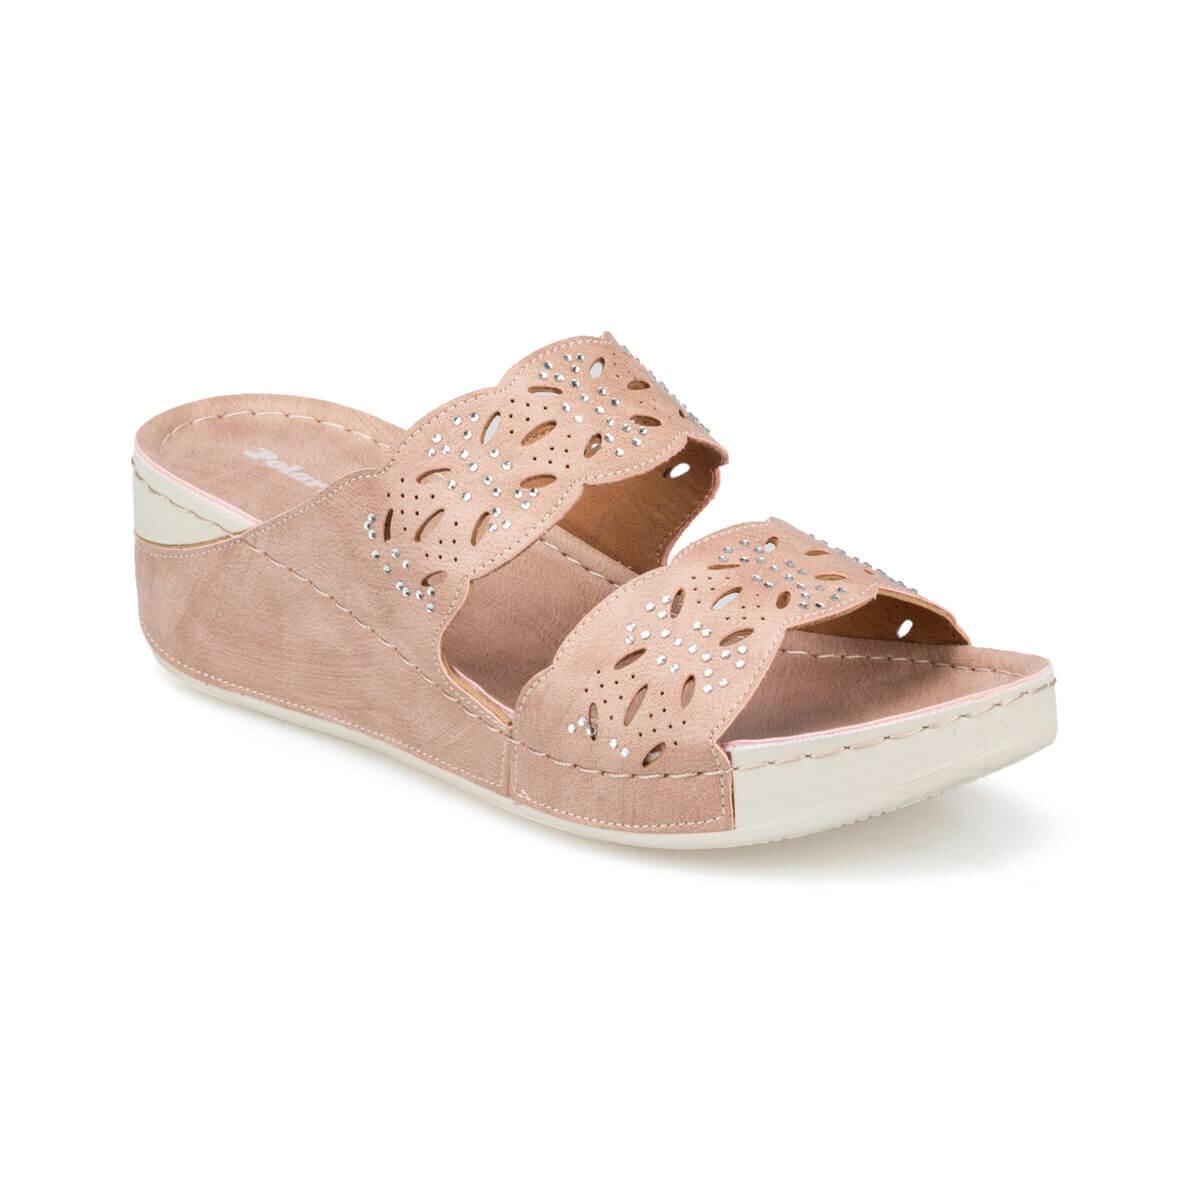 FLO 91. 150894.Z Powder Women 'S Slippers Polaris